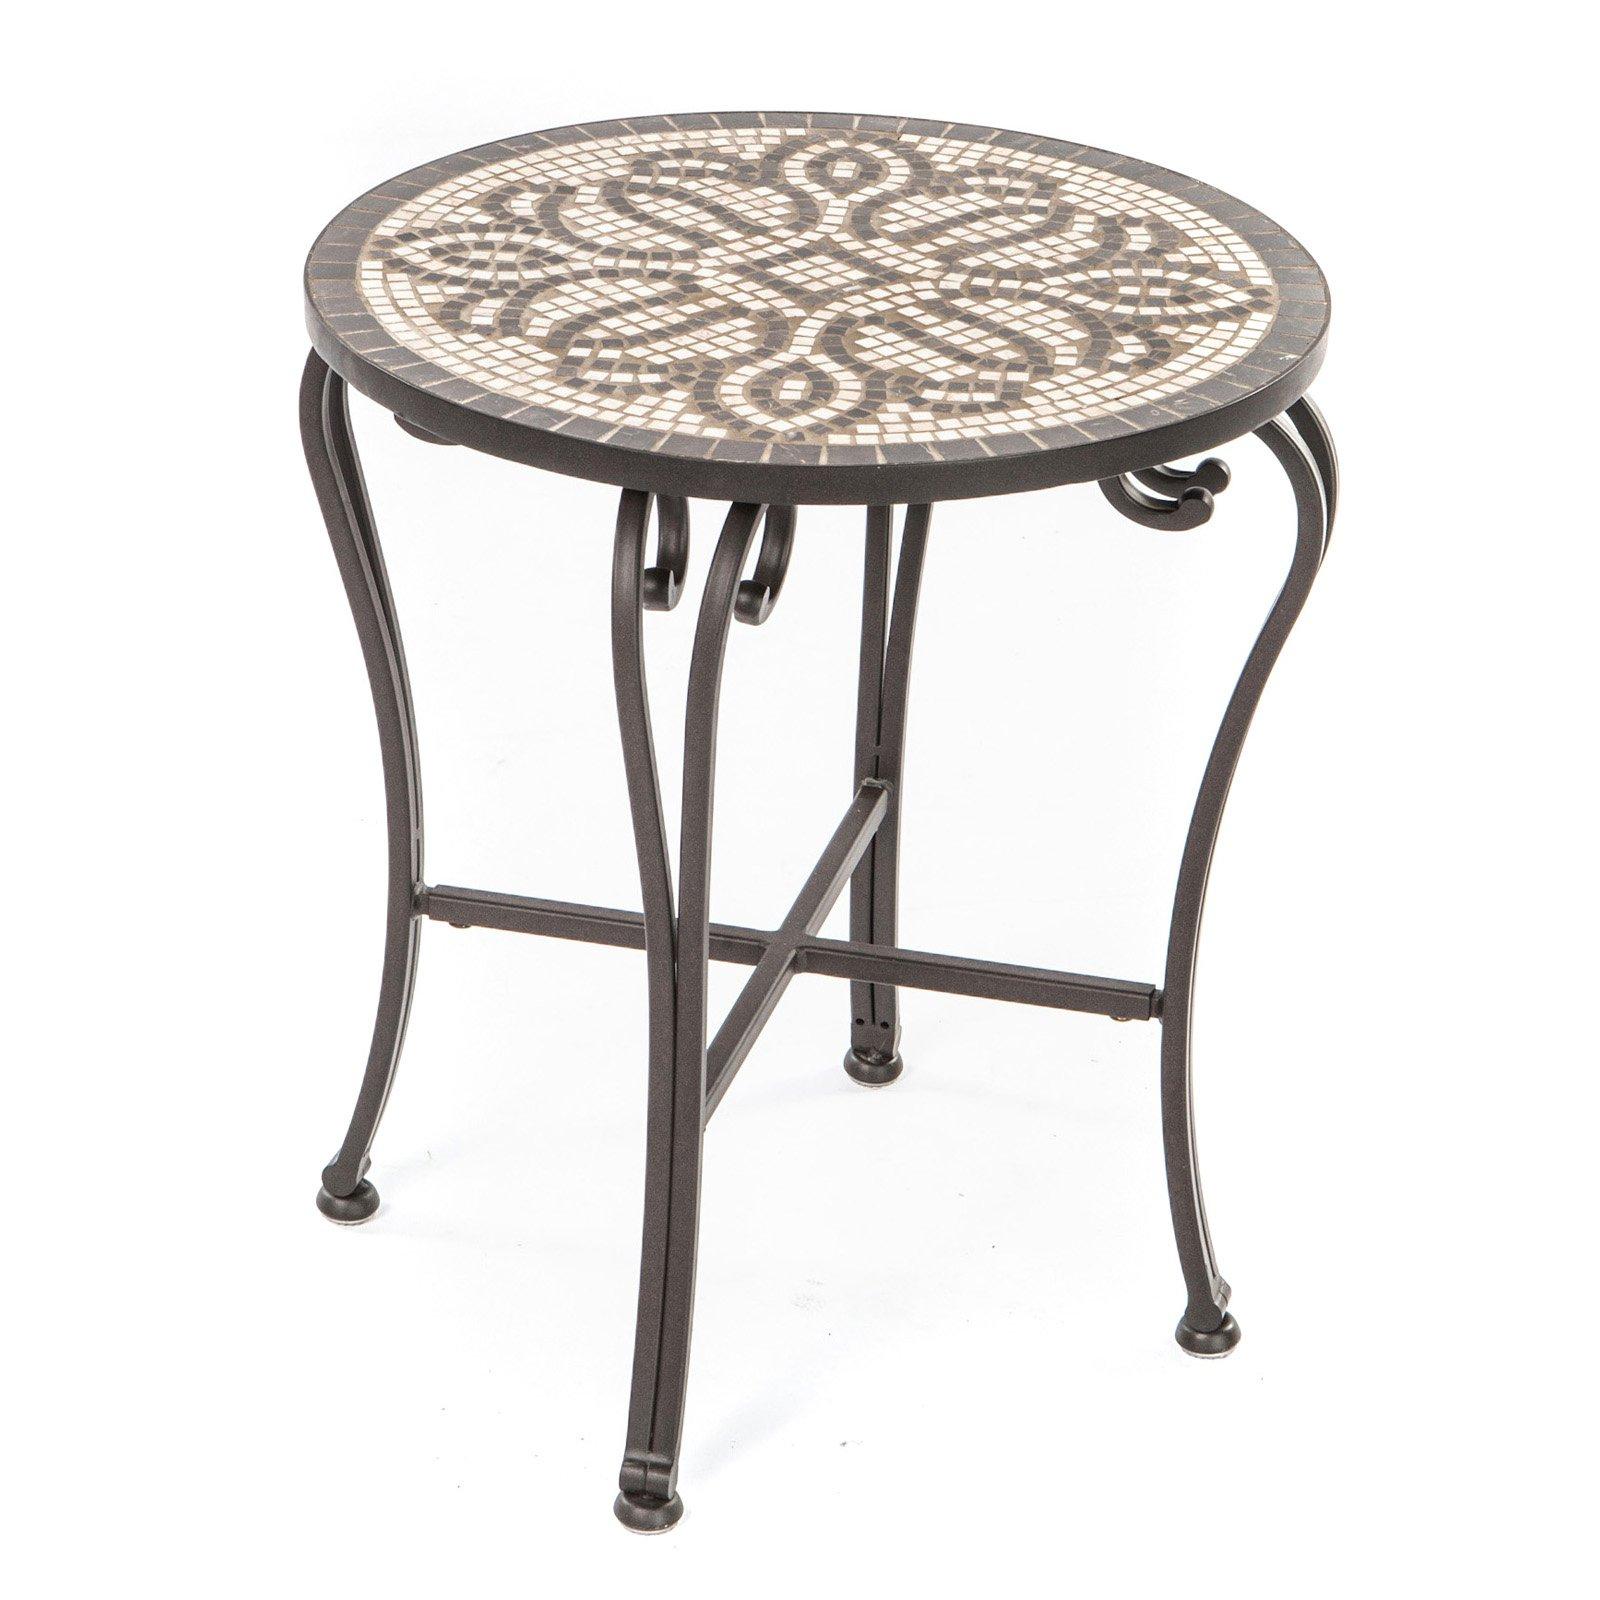 patio accent table darcylea design large tables metal outdoor target leather chair end set west elm tripod lamp buffet hutch antique drop leaf pedestal bathtub side rustic